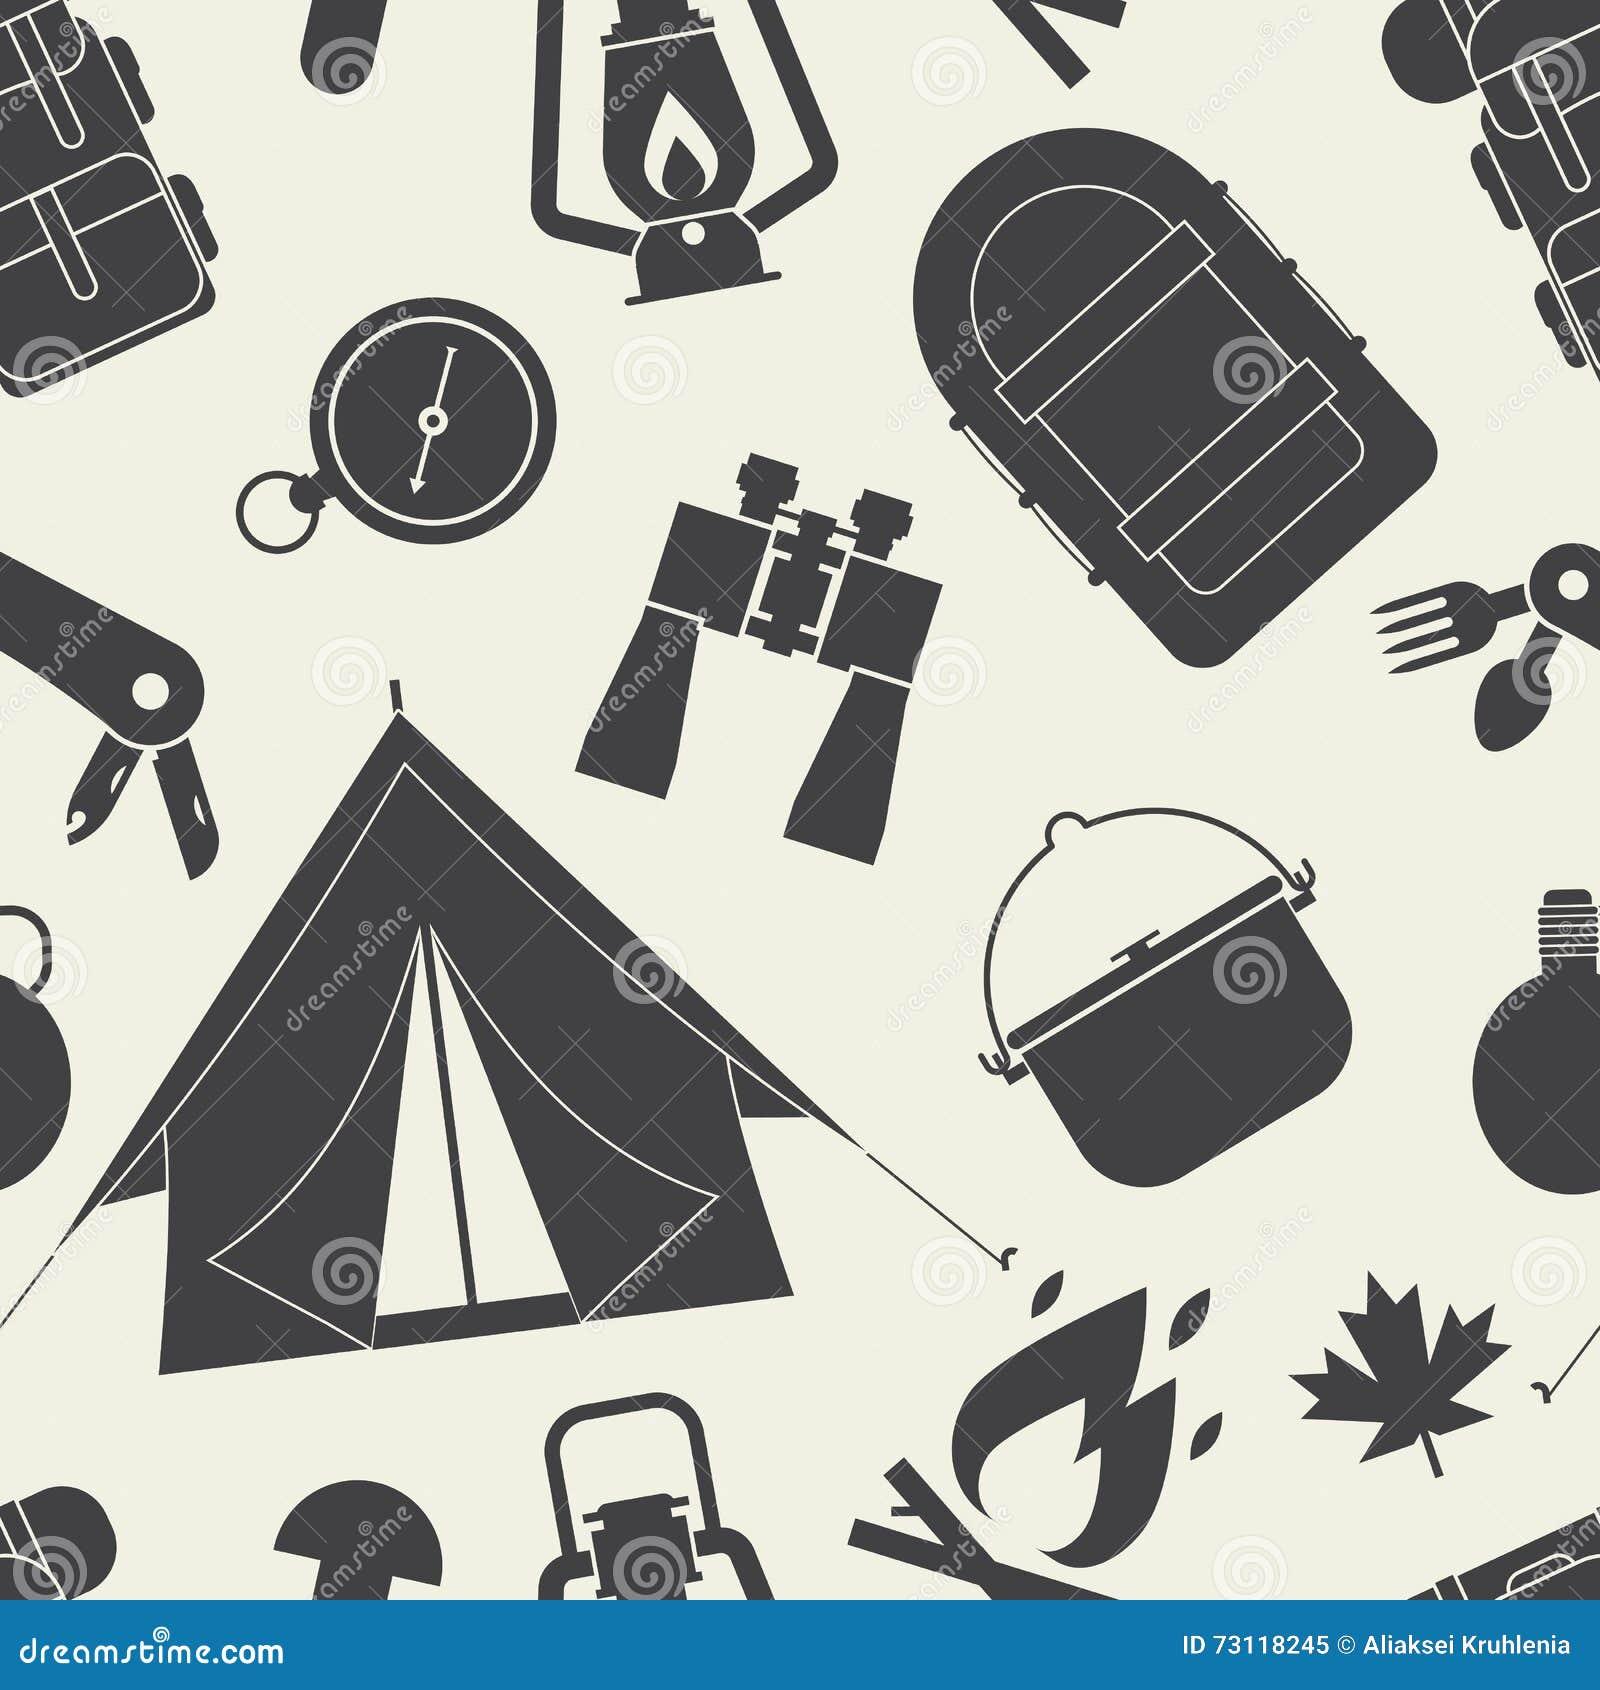 hiking silhouette desktop wallpaper - photo #35